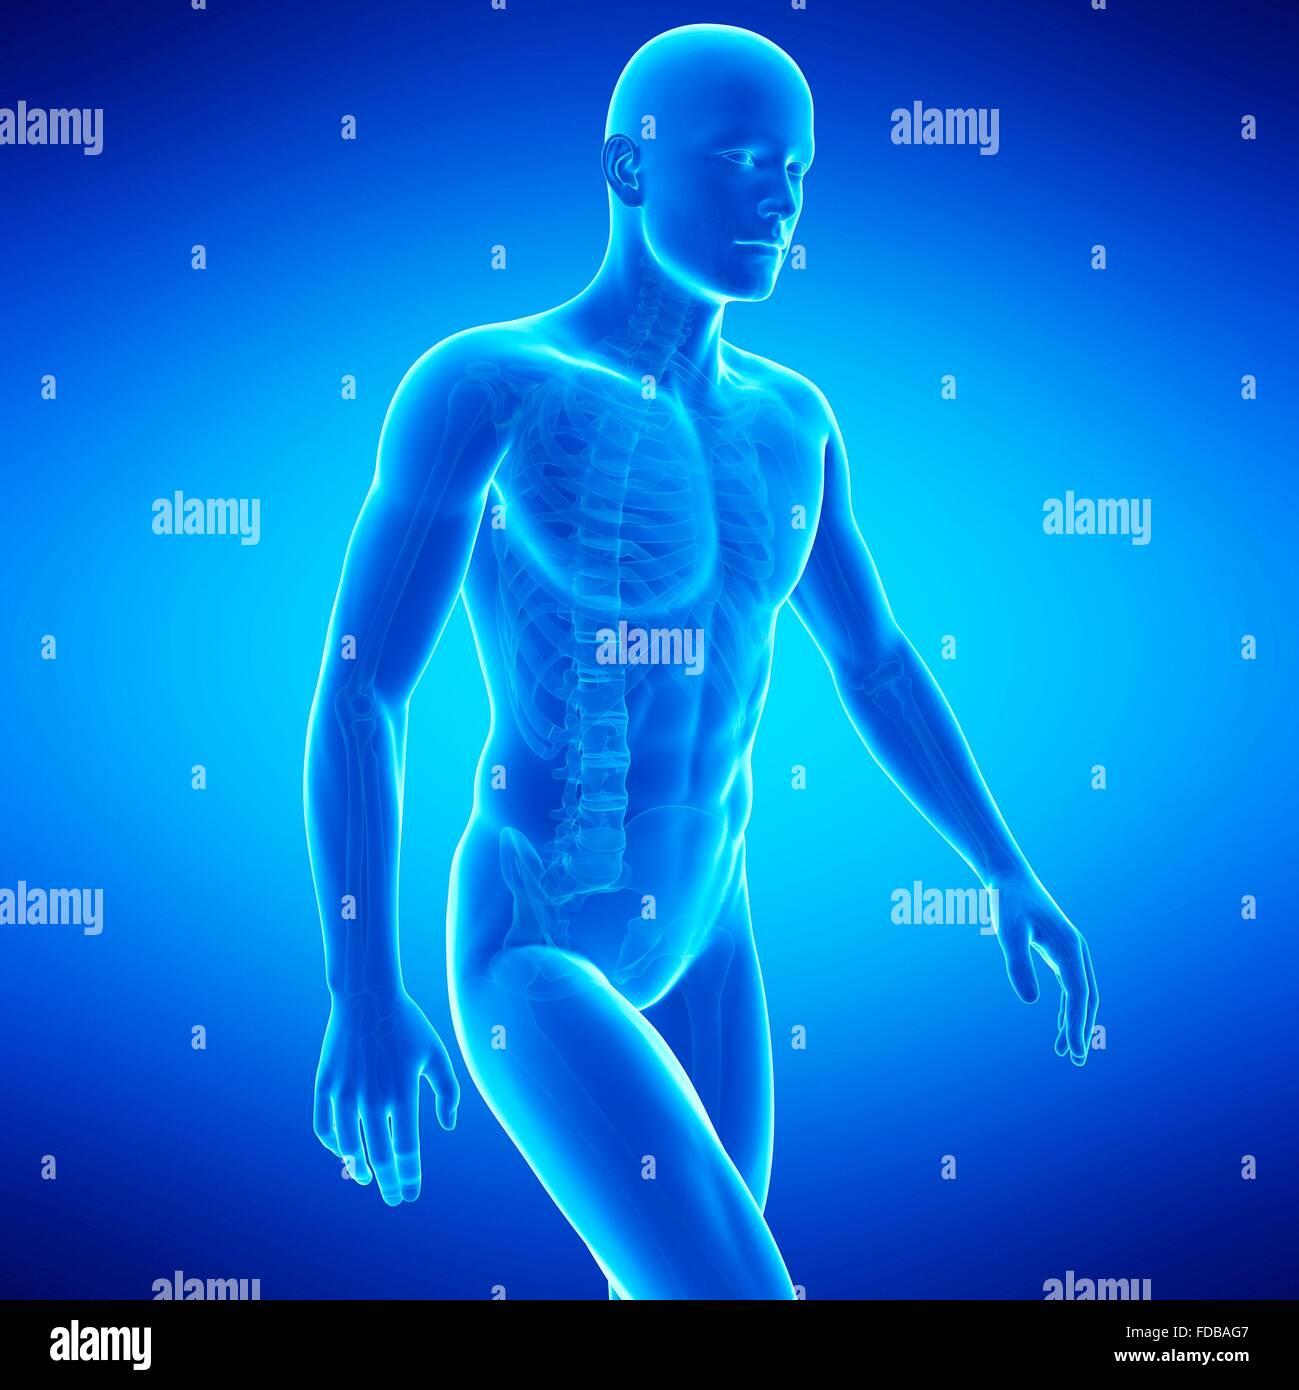 Human anatomy, illustration. - Stock Image